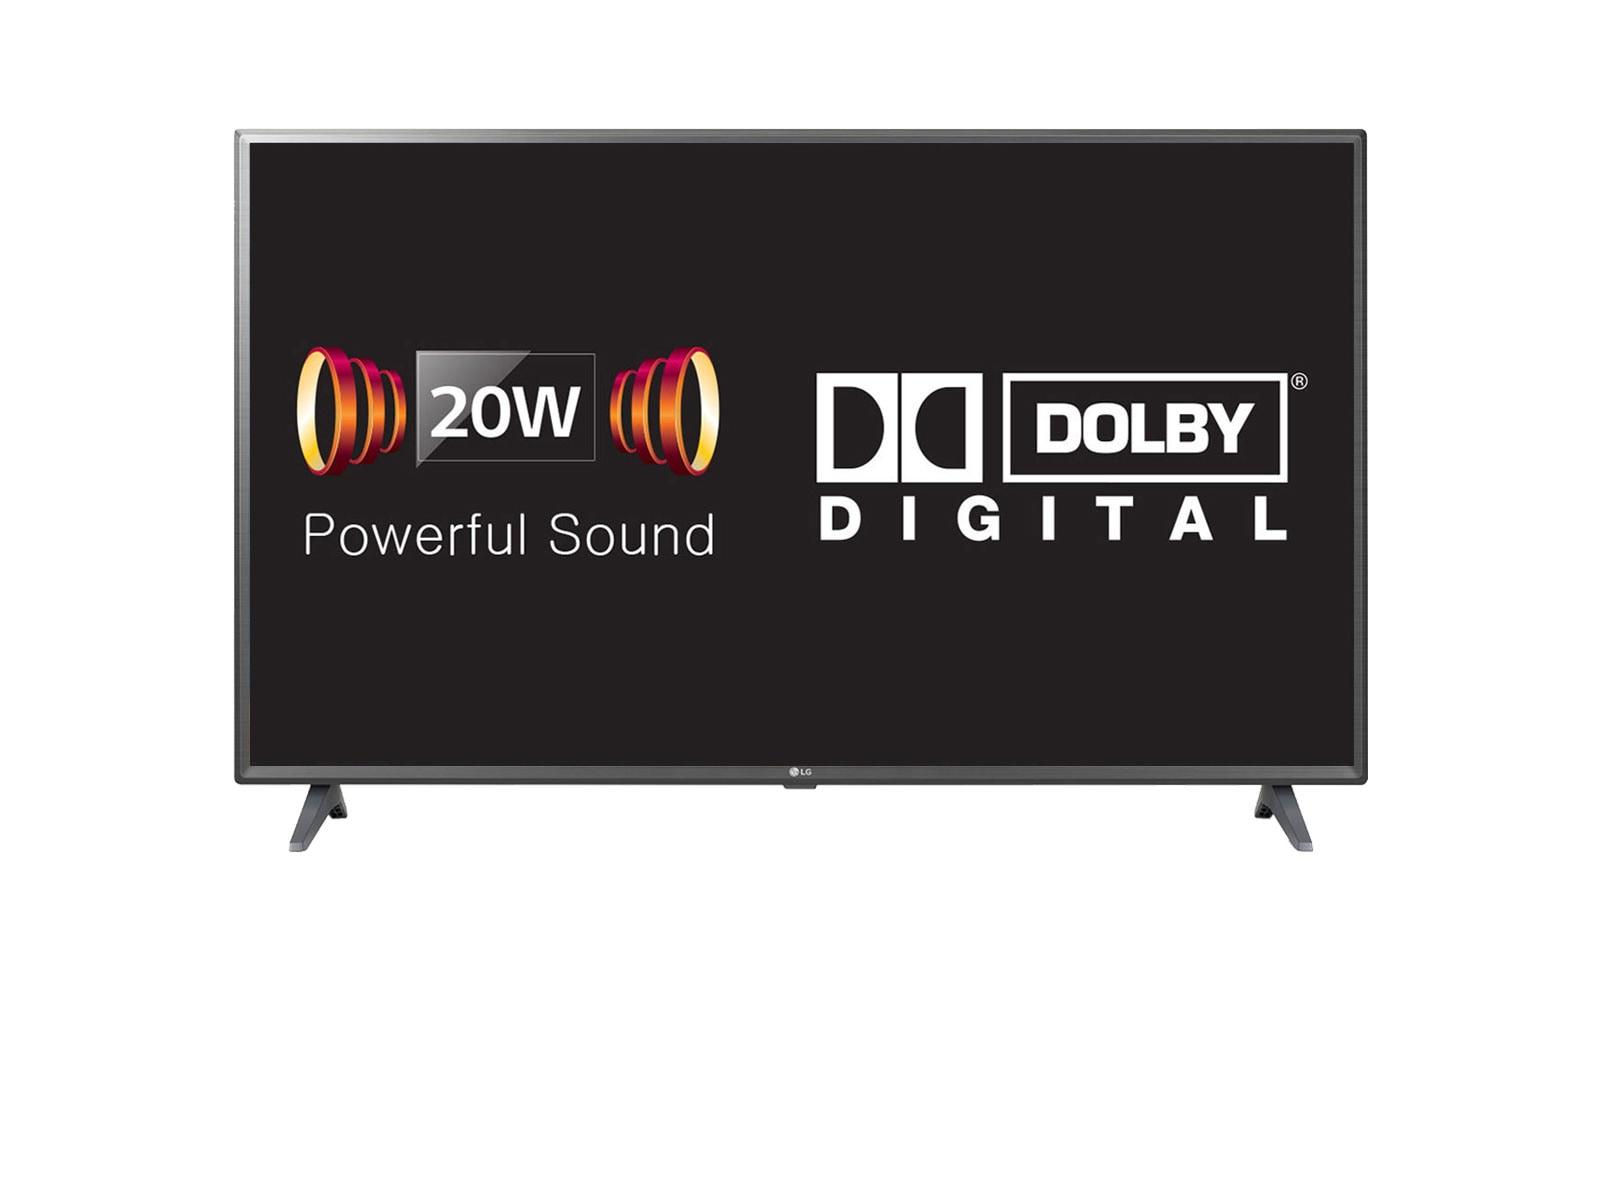 LG 20W Powerful Sound LED TV